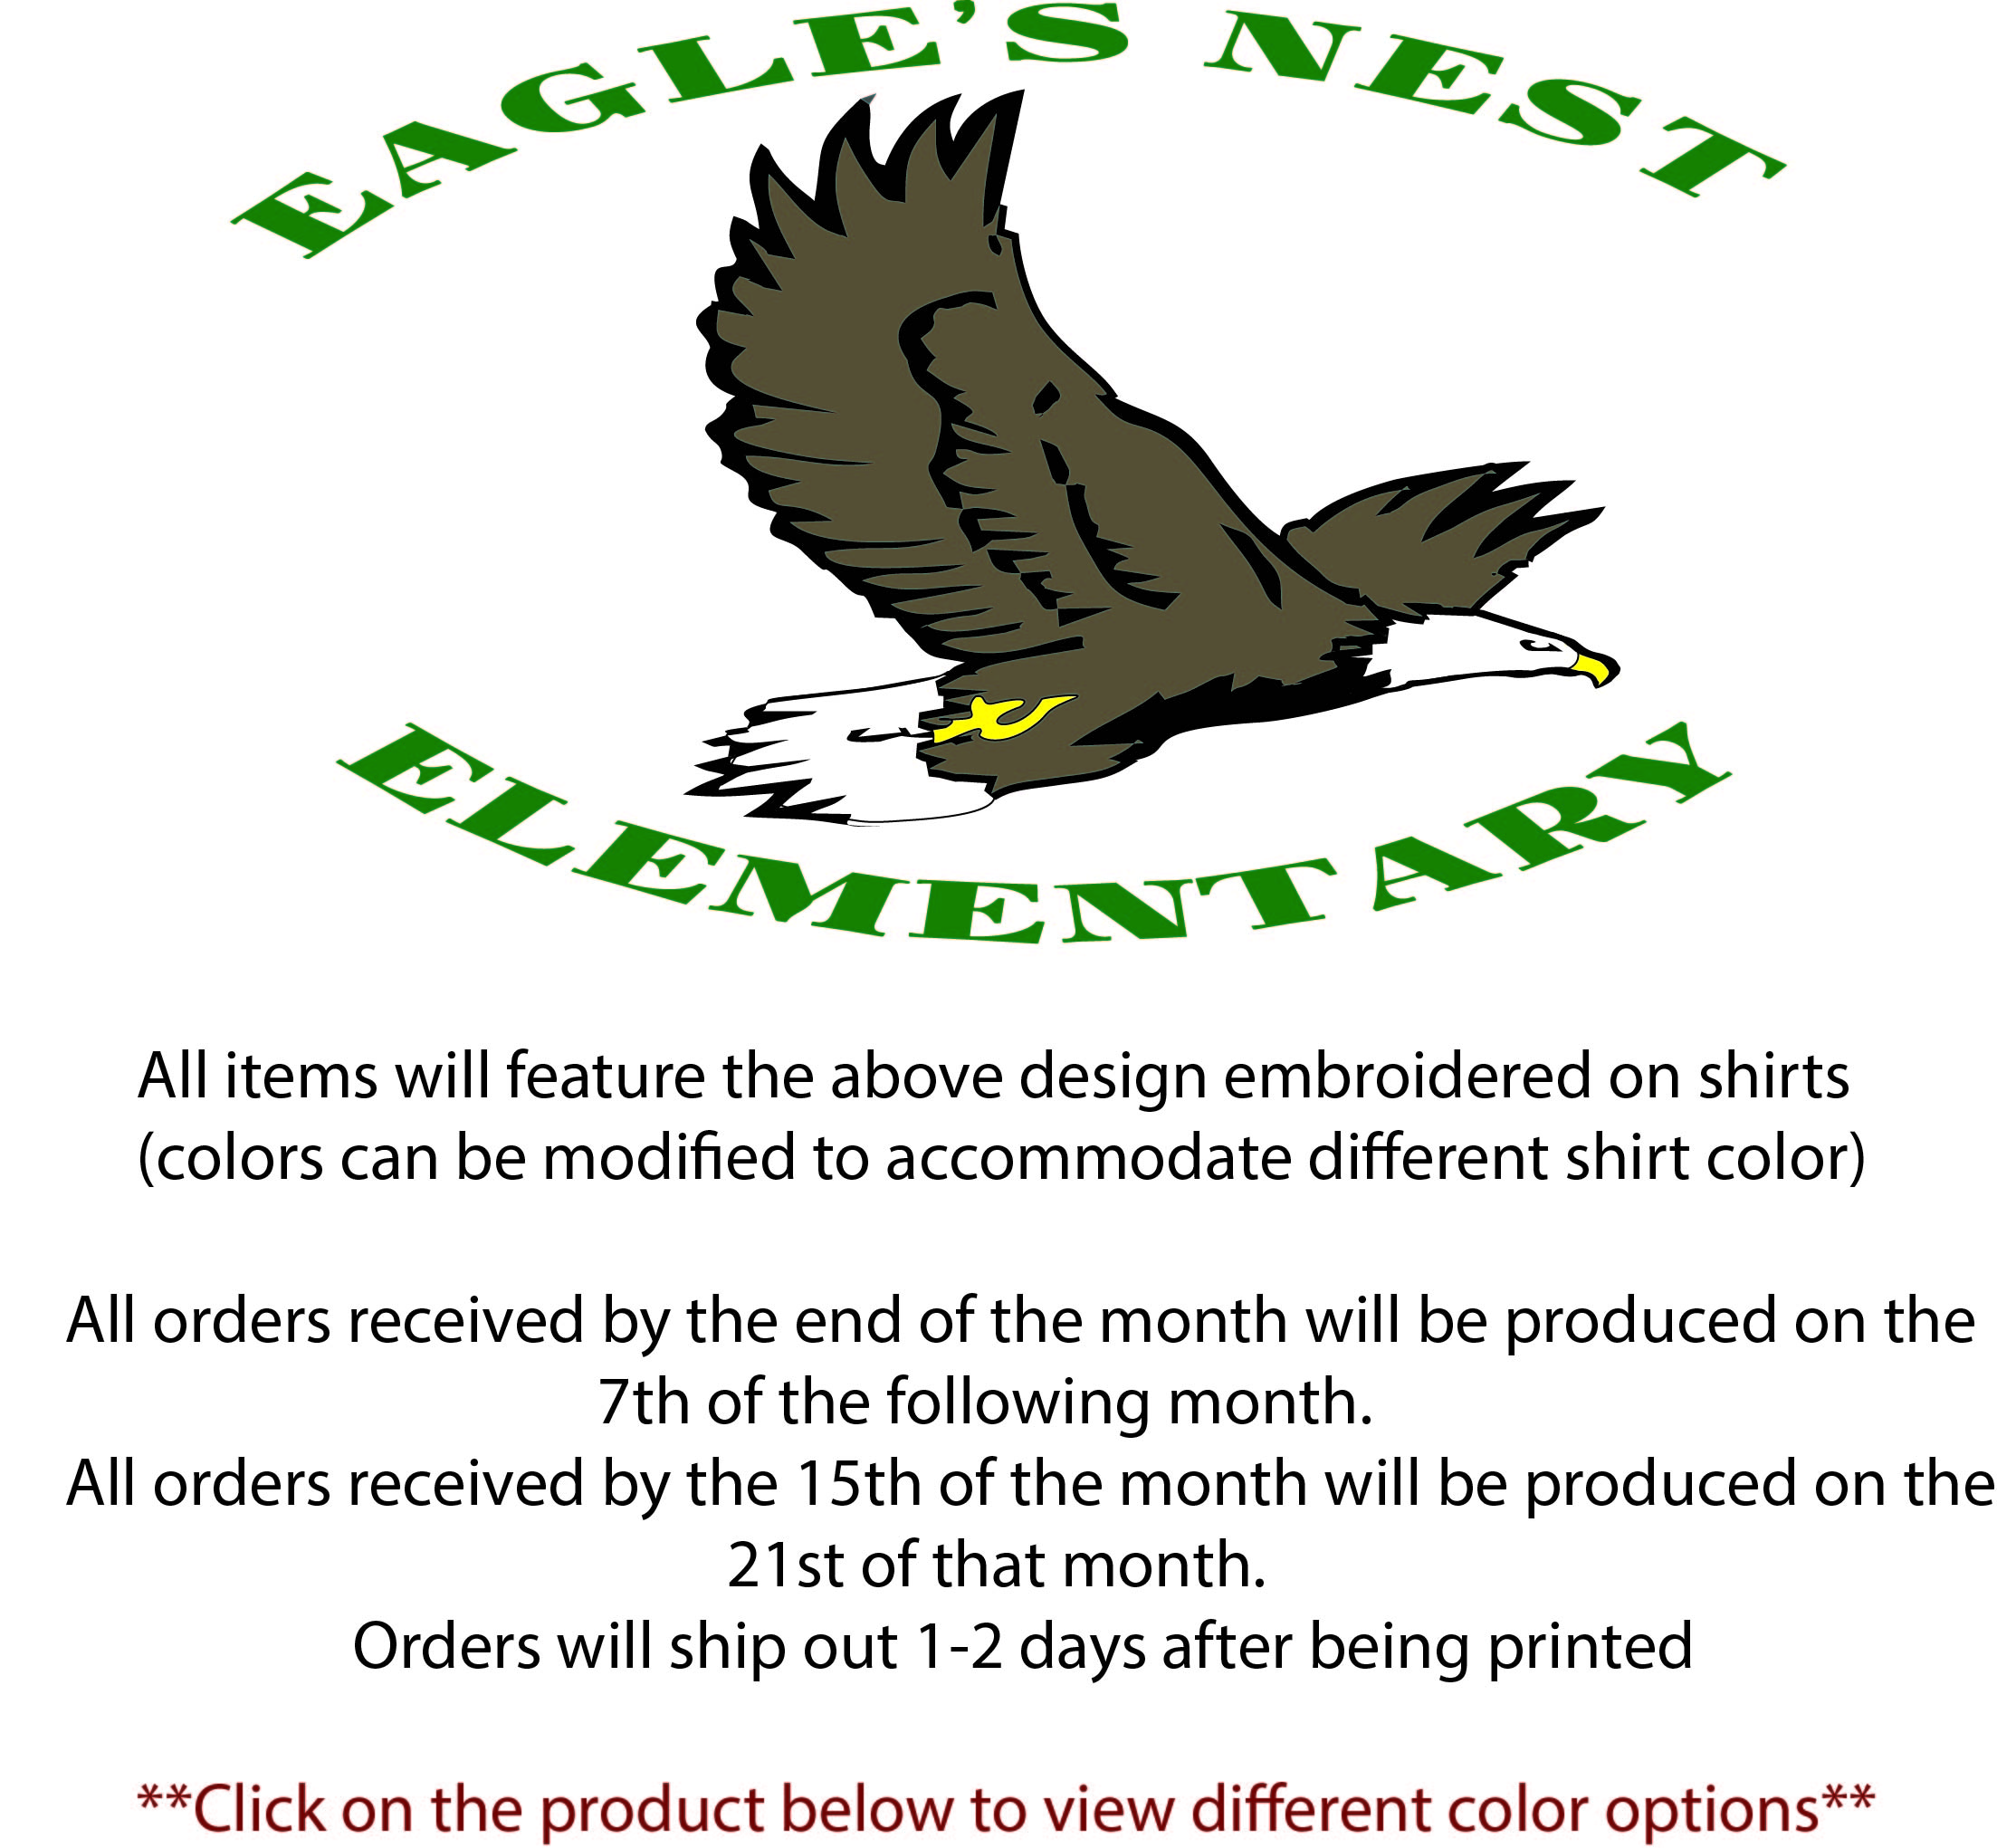 eagle-s-nest-web-site-header.jpg